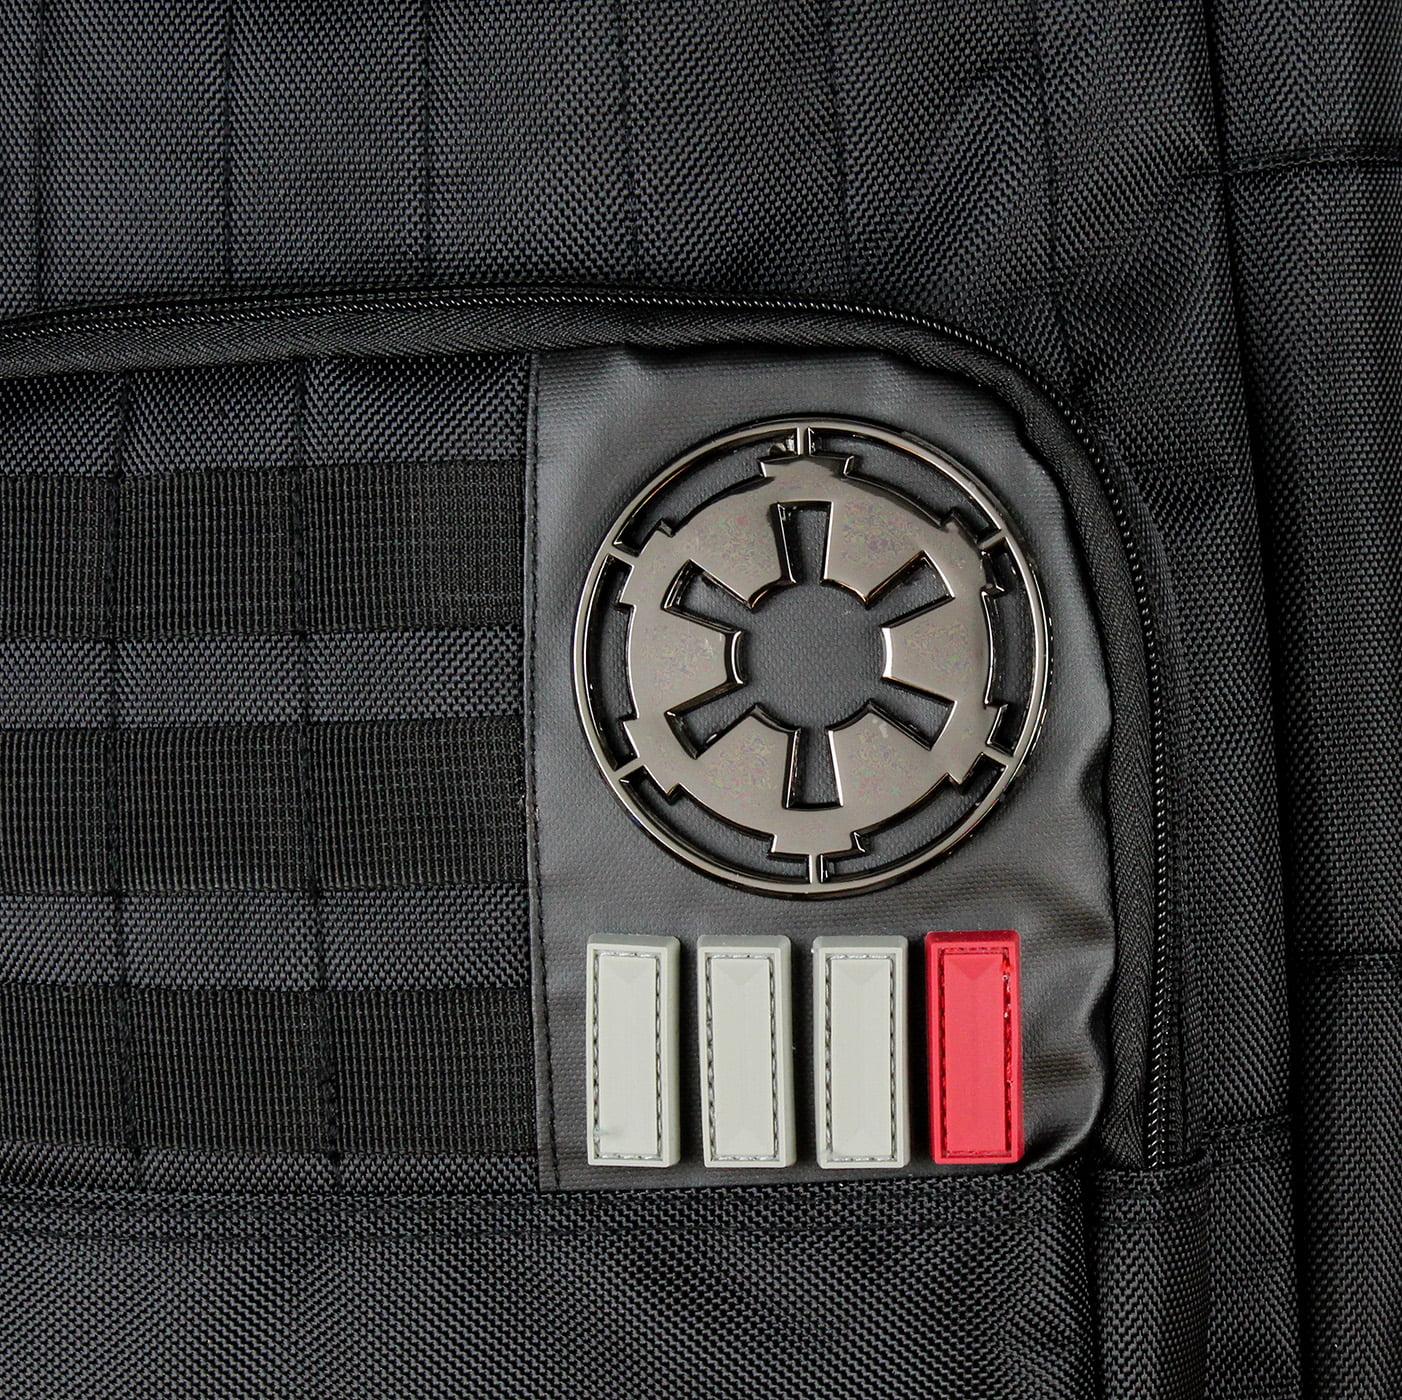 Star Wars Darth Vader Costume School Bag Padded Sleeve Tech Laptop Backpack